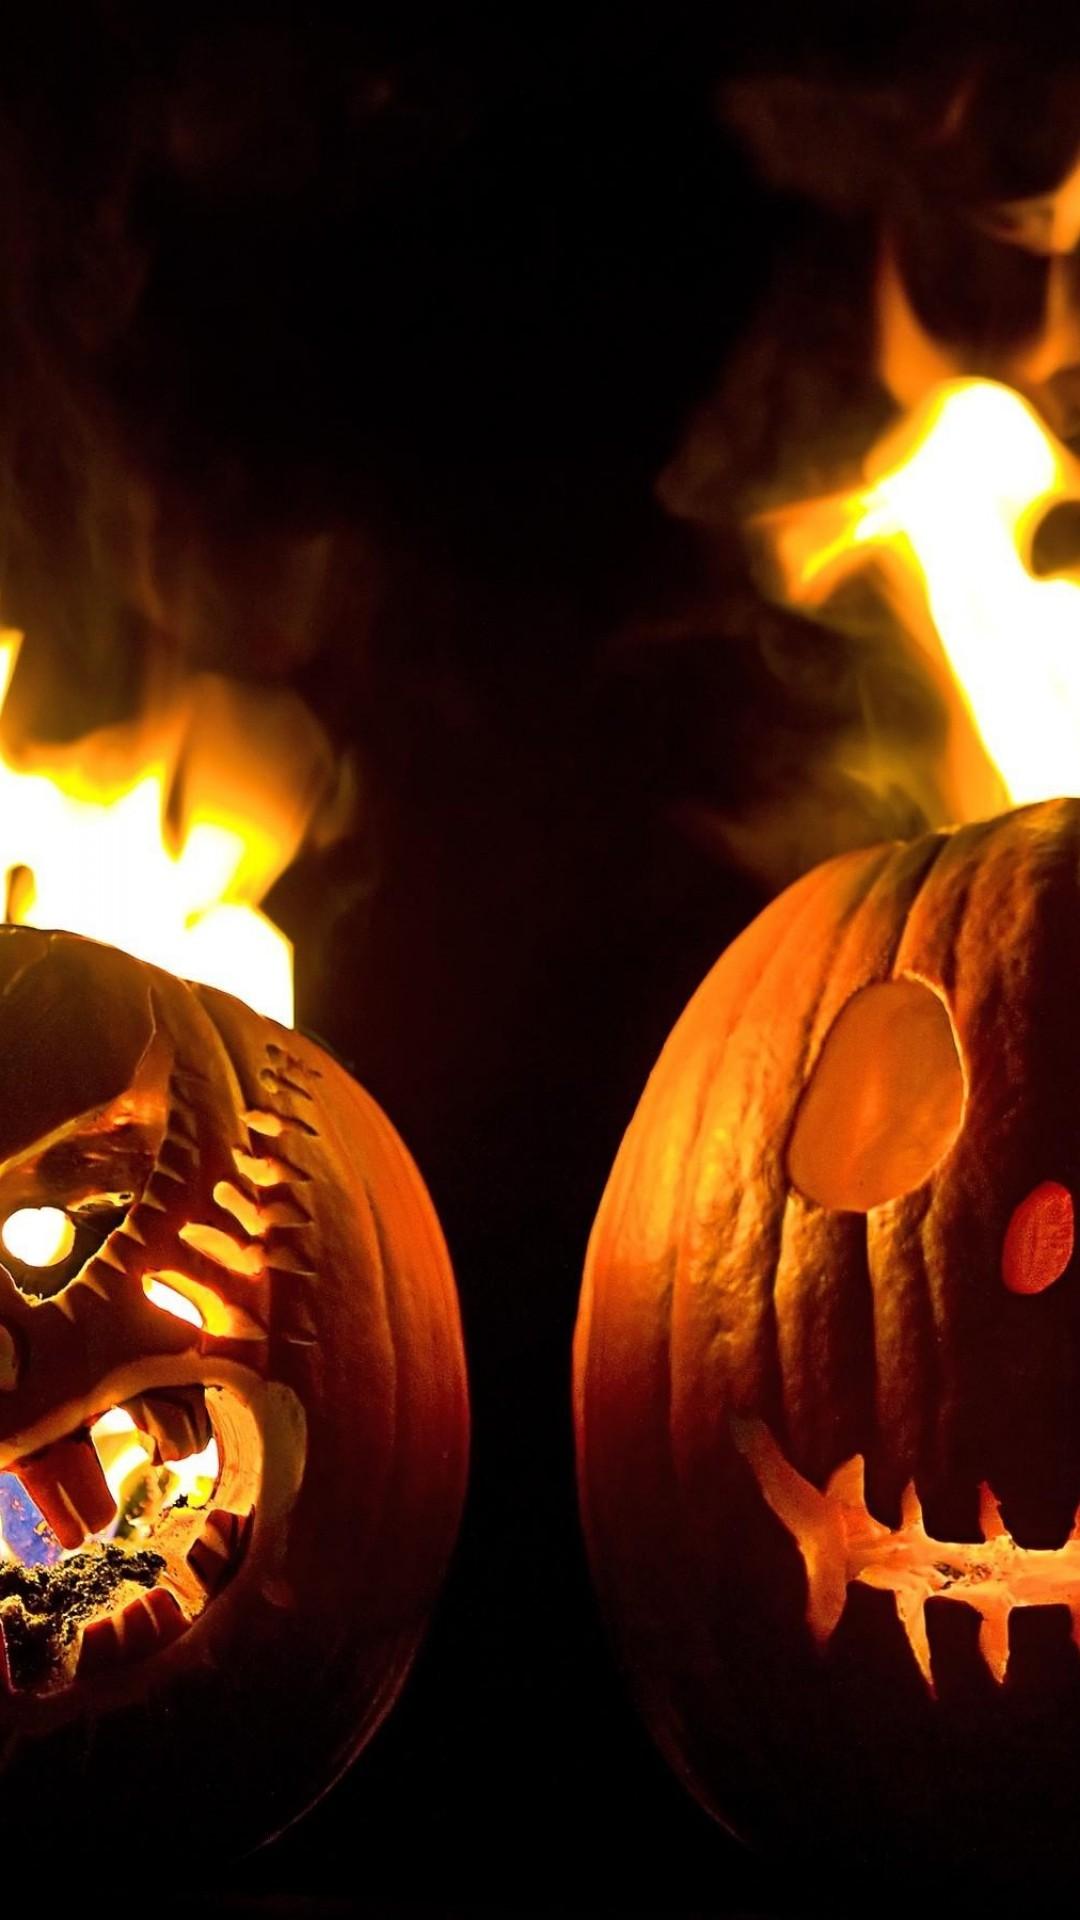 Two Halloween Pumpkins Fire Android Wallpaper free download. Two Halloween  Pumpkins Fire Android Wallpaper Free Download